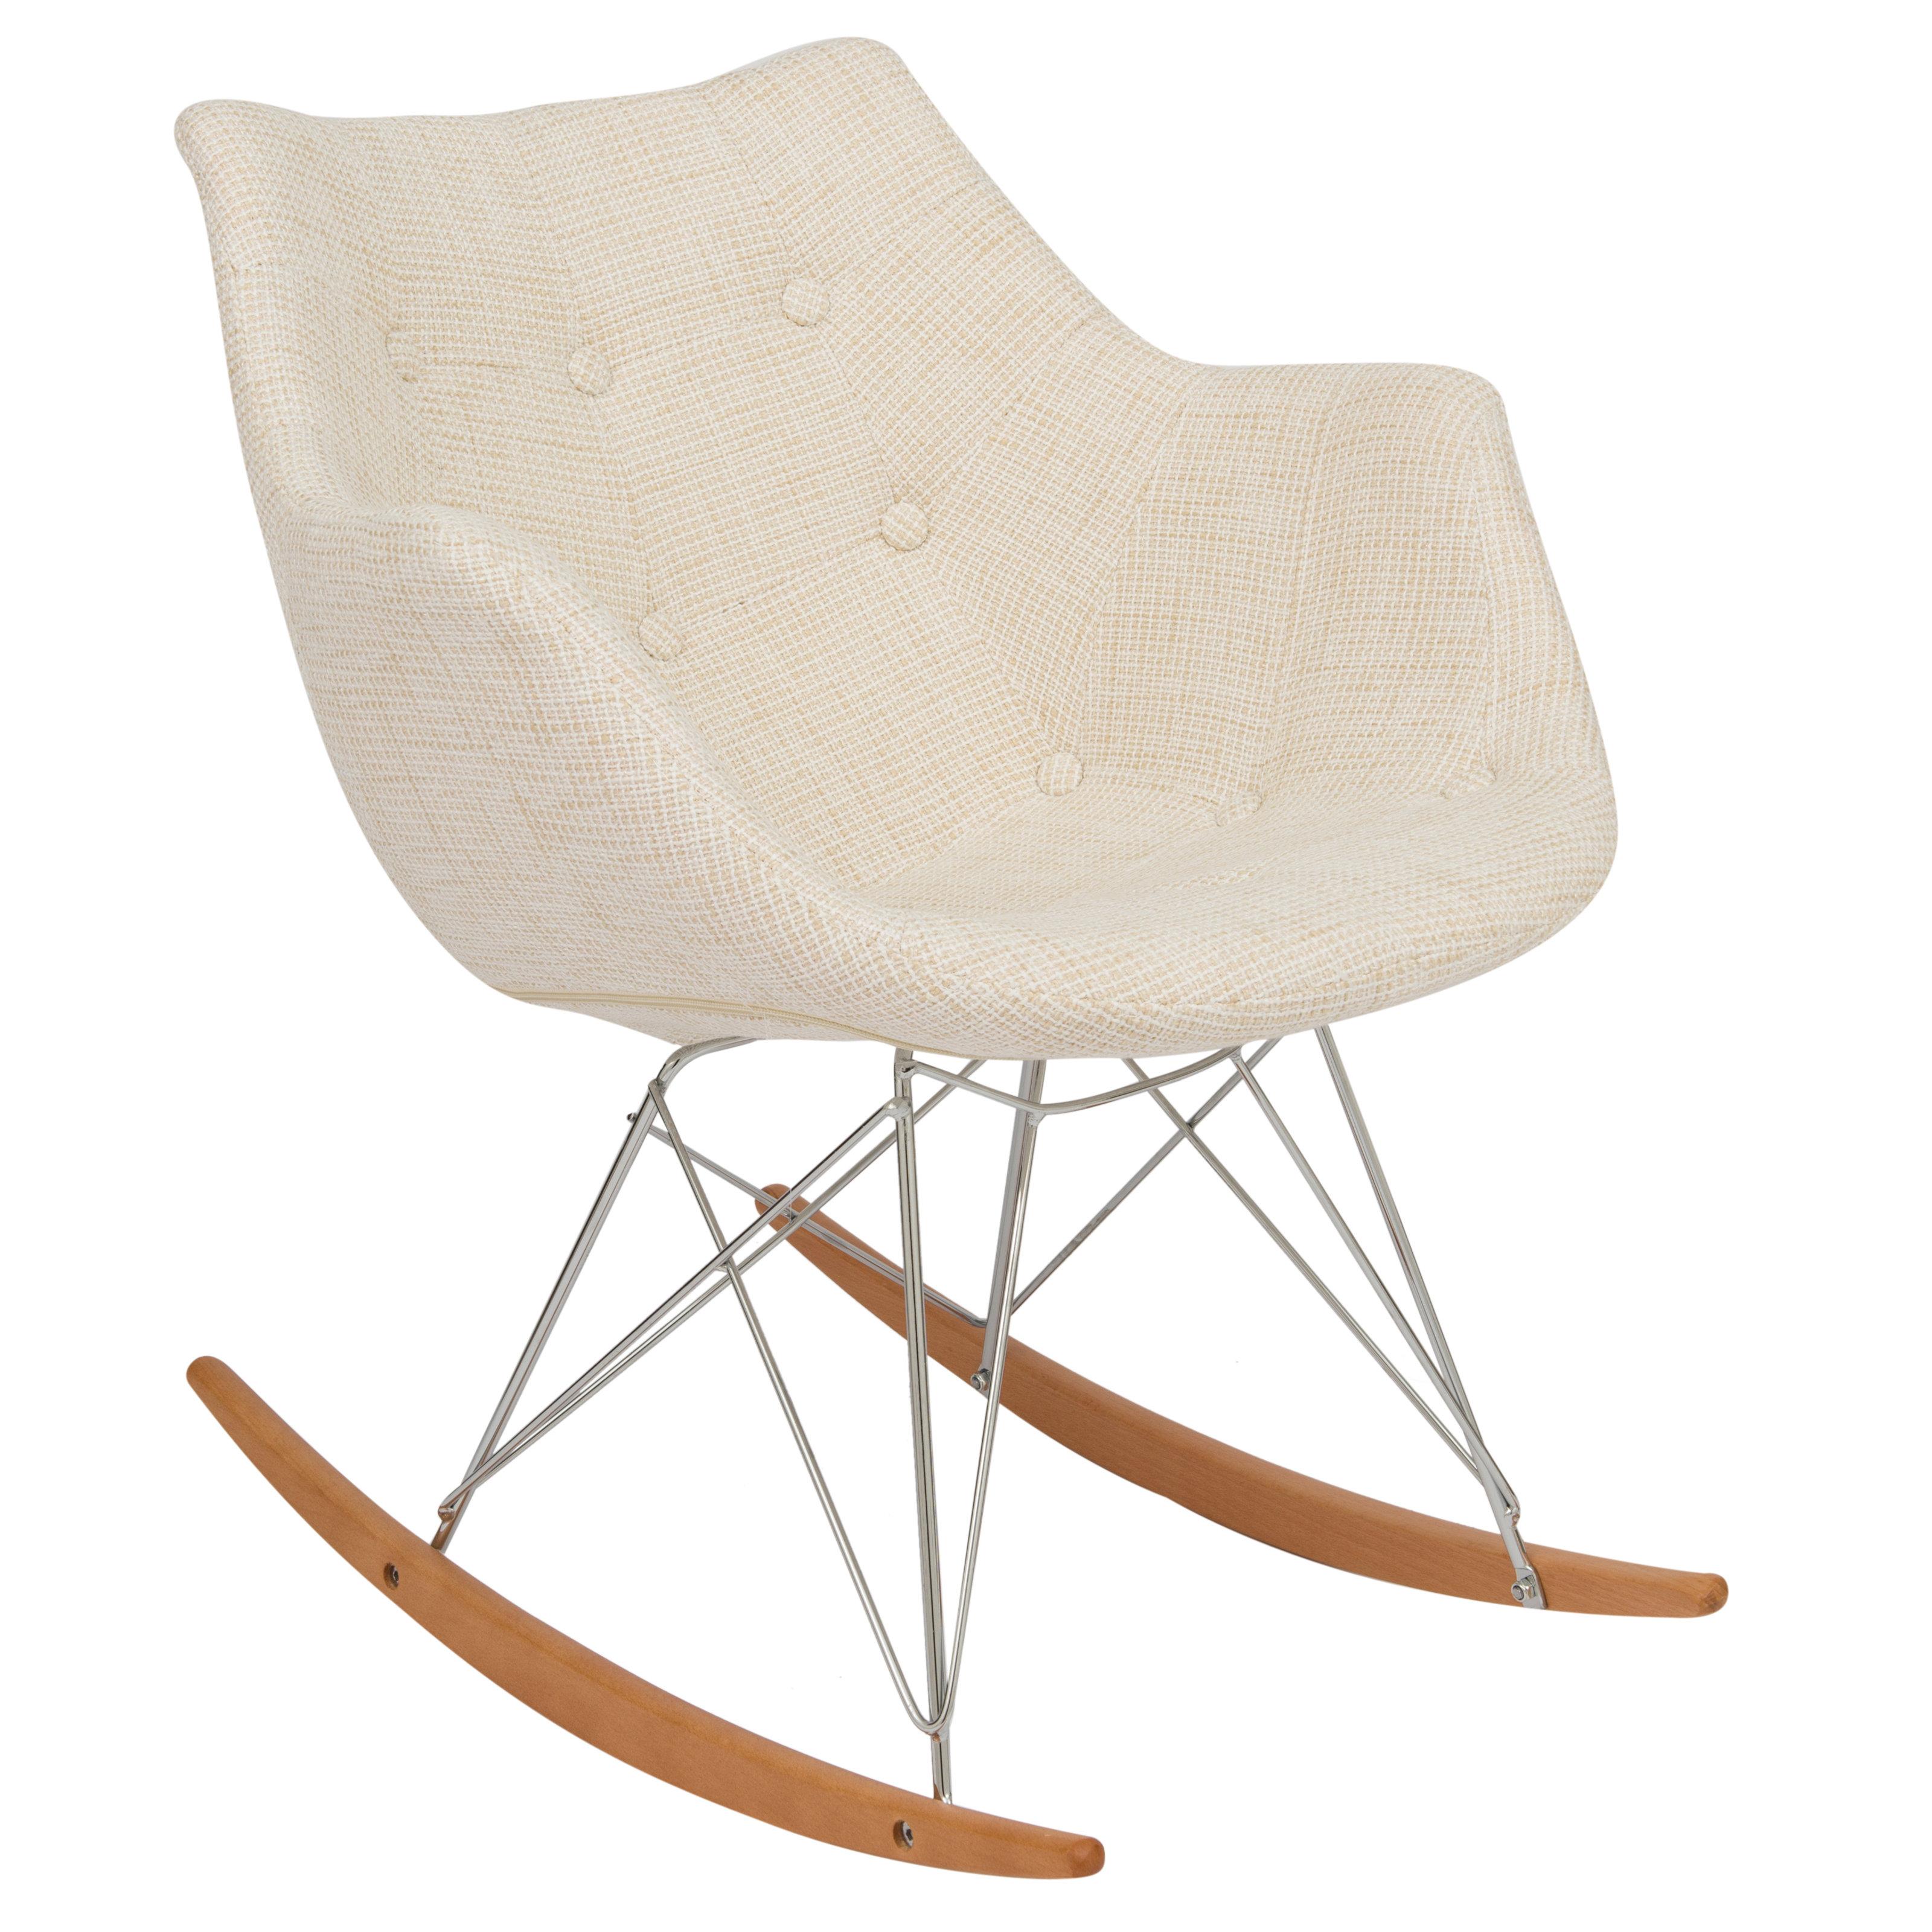 LeisureMod Willow Rocking Chair | Wayfair